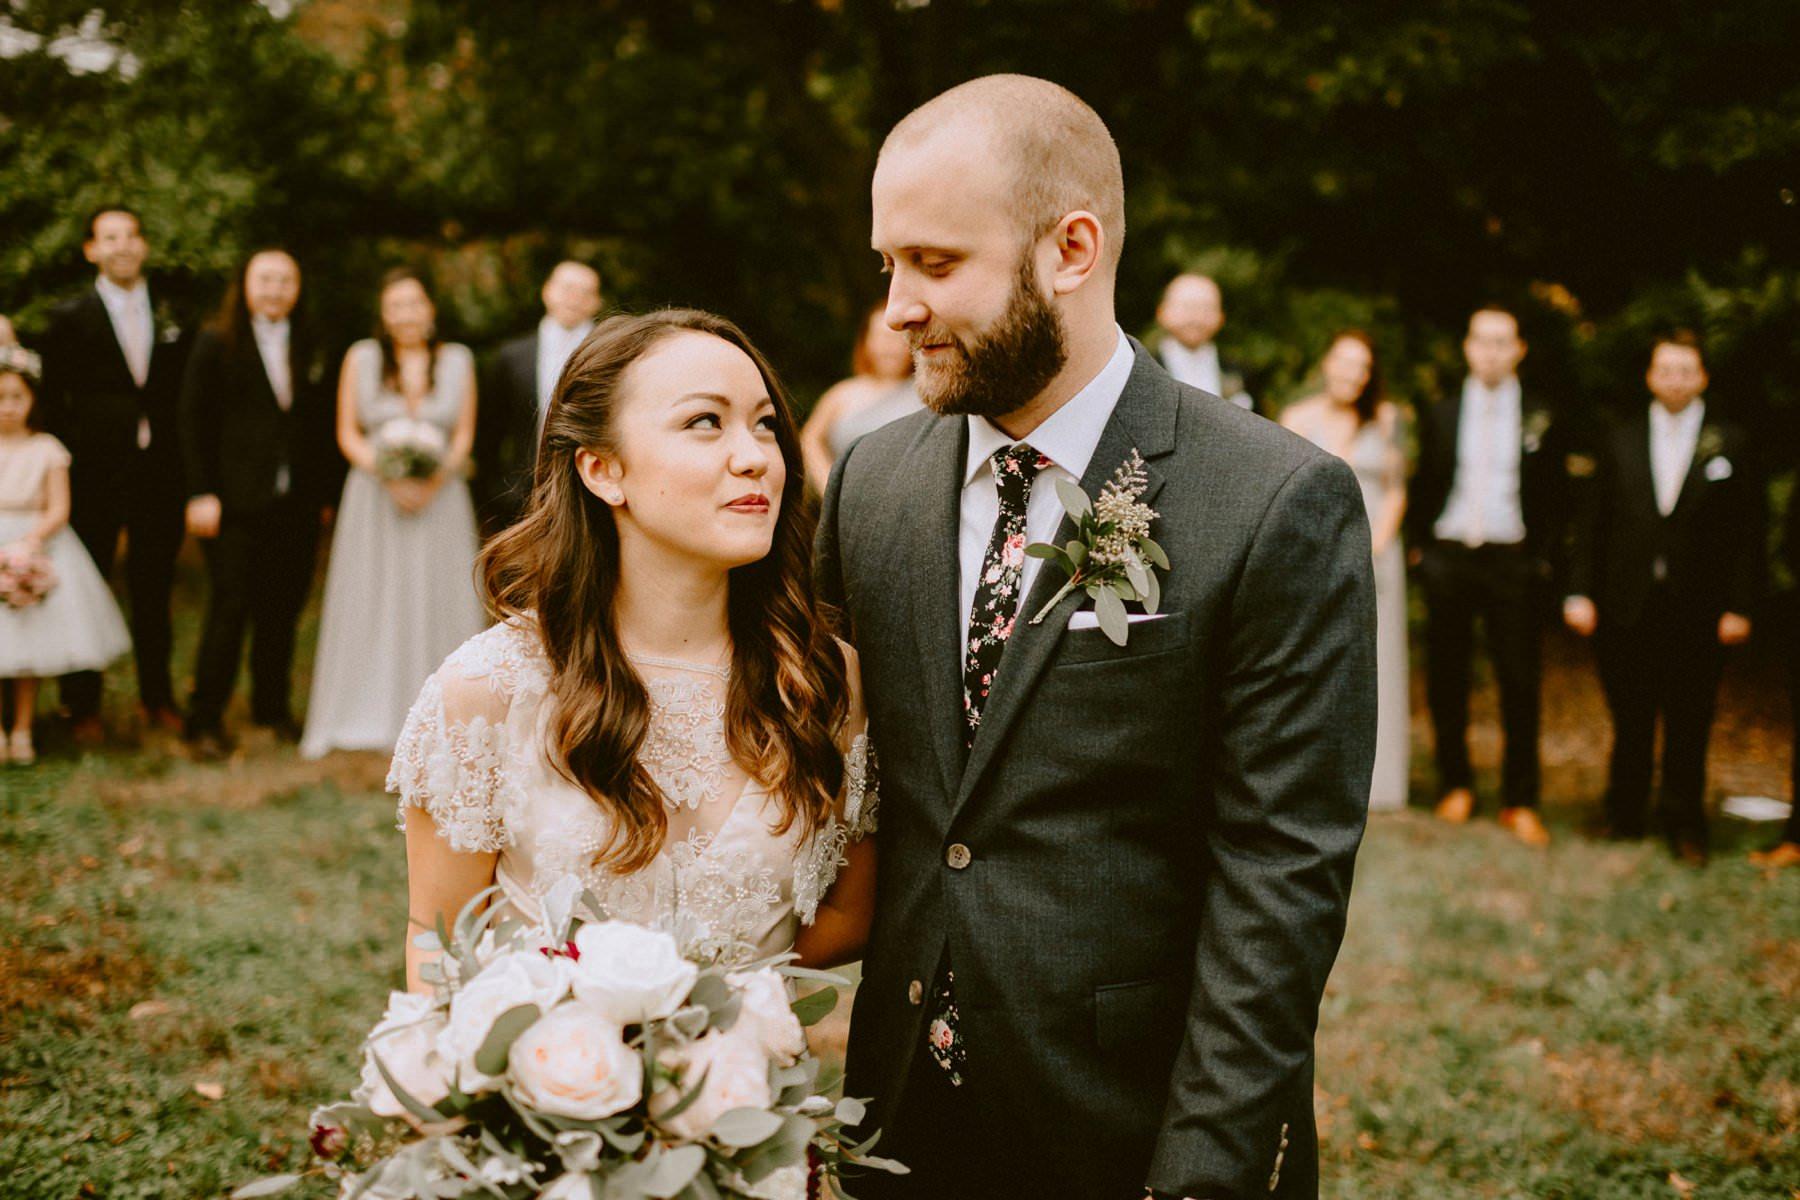 Tyler_arboretum_wedding-024.jpg